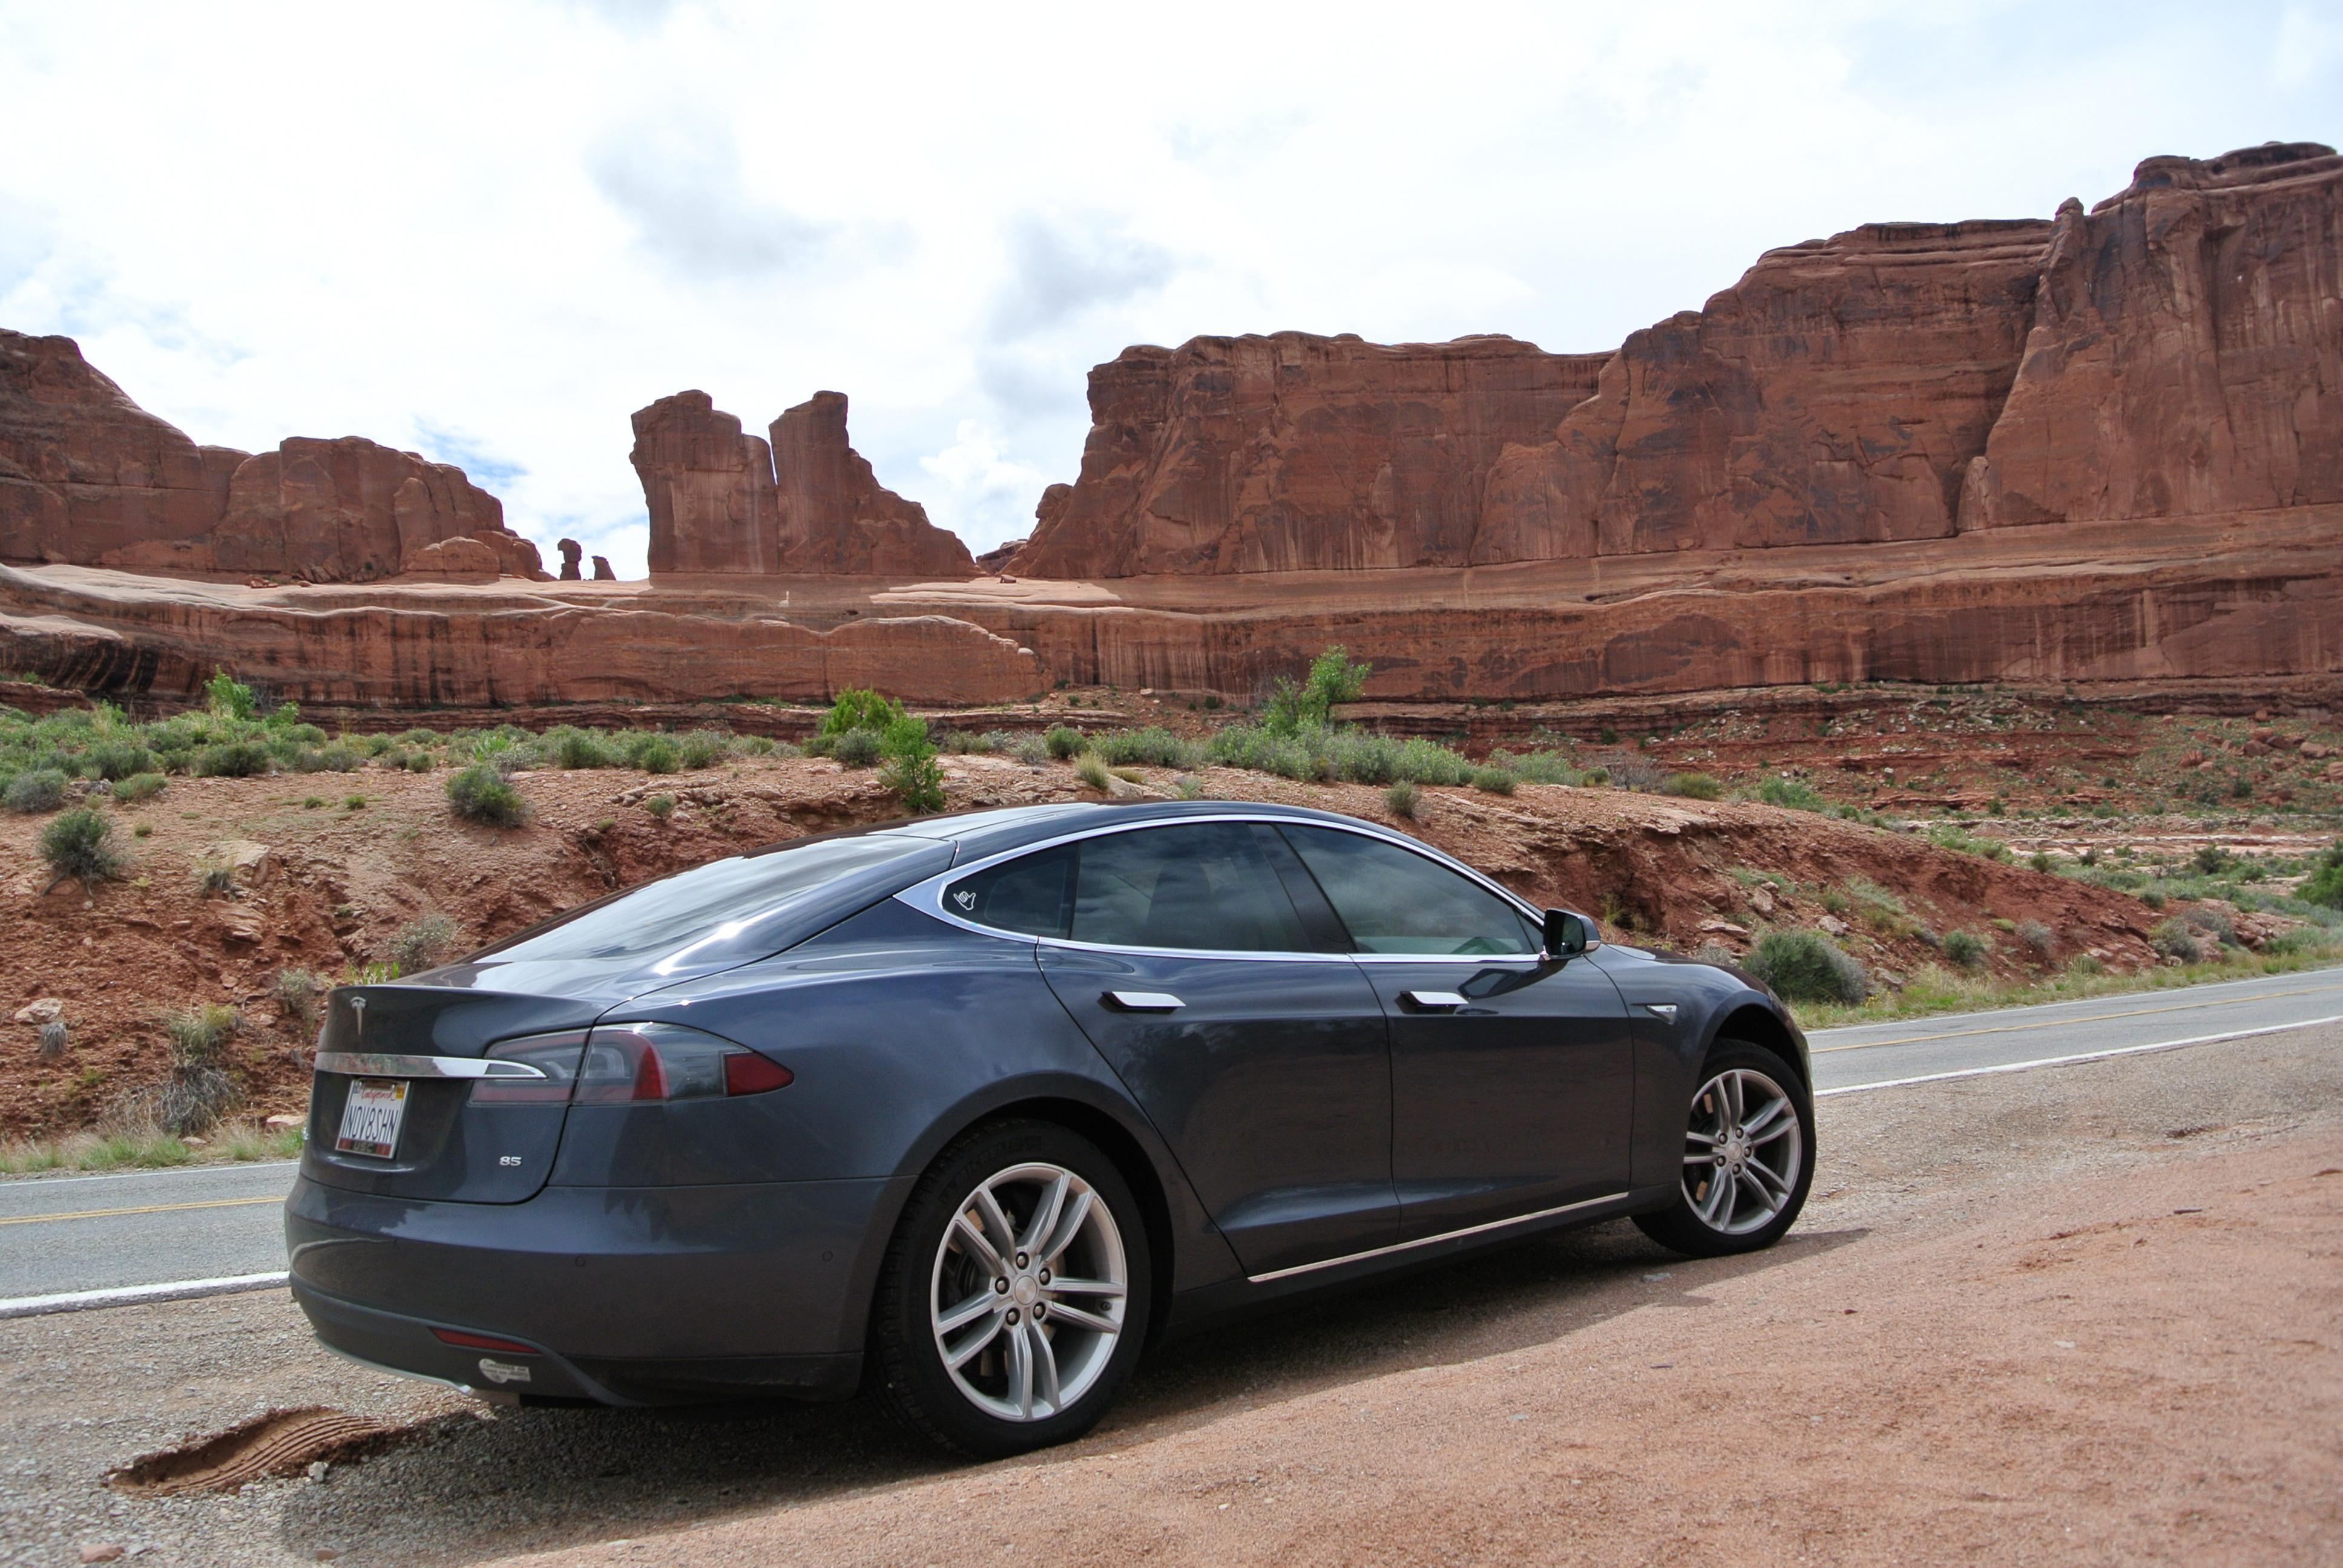 Tesla 2015-06-11 DSC_6509 Arches NP.jpg